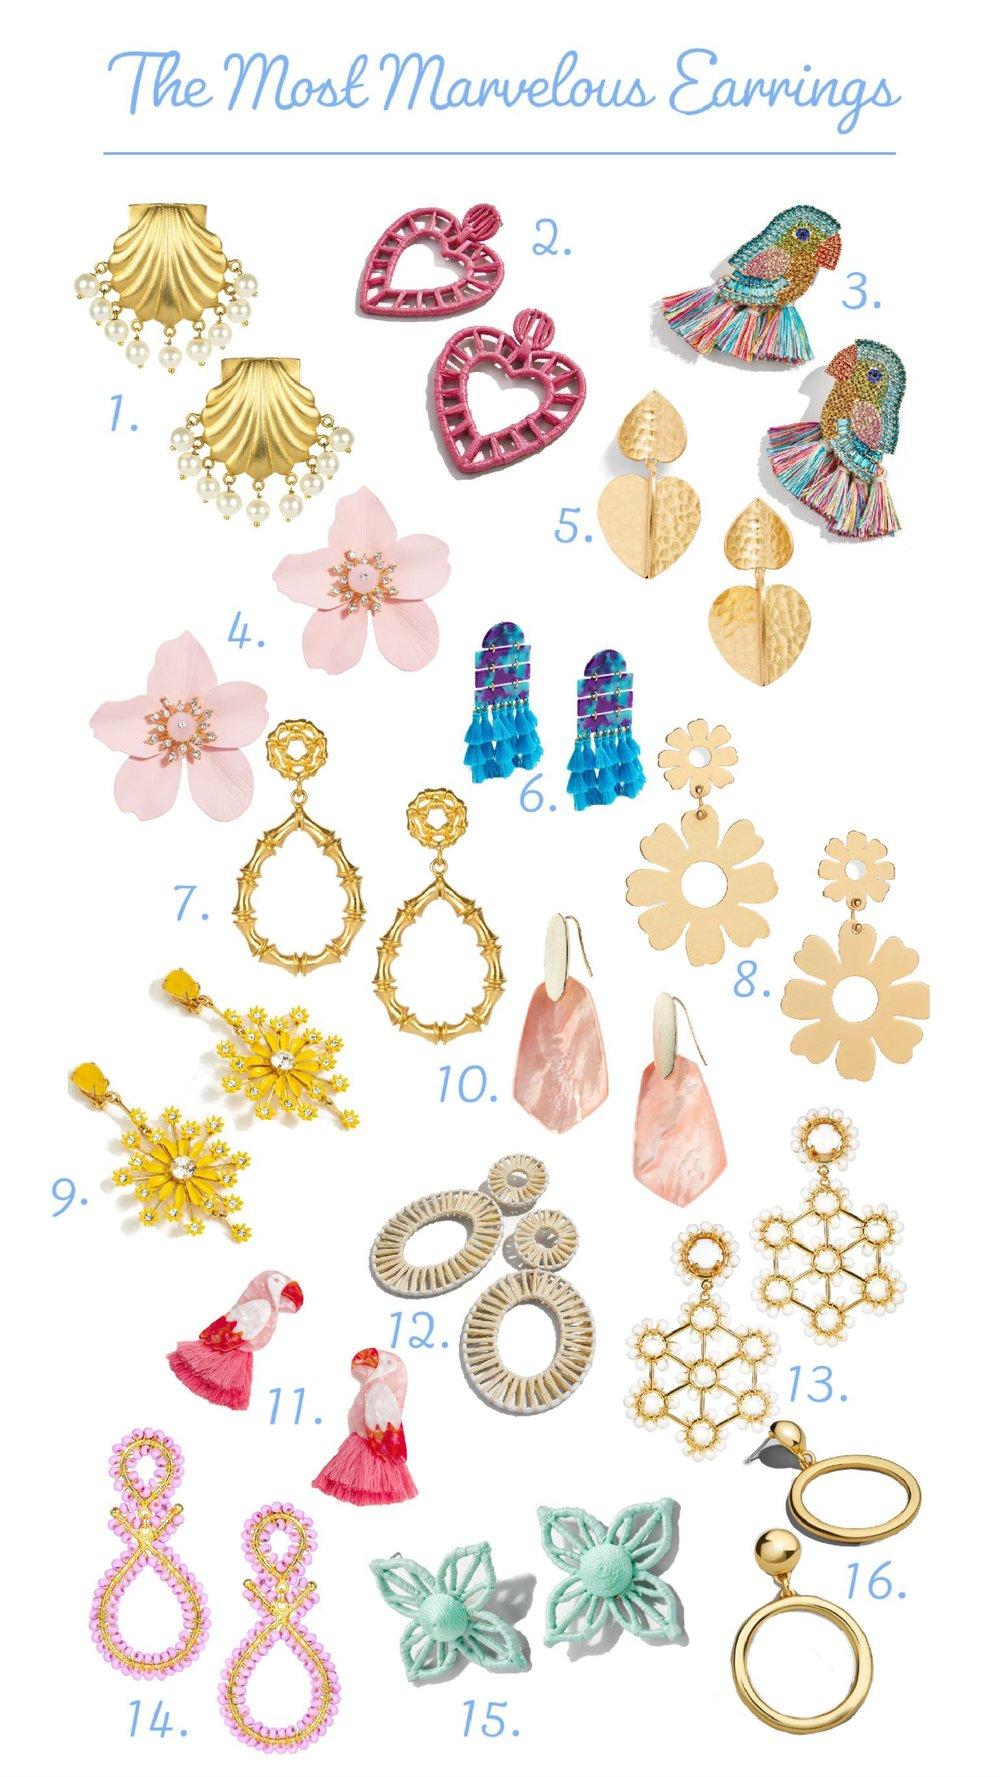 the most marvelous earrings